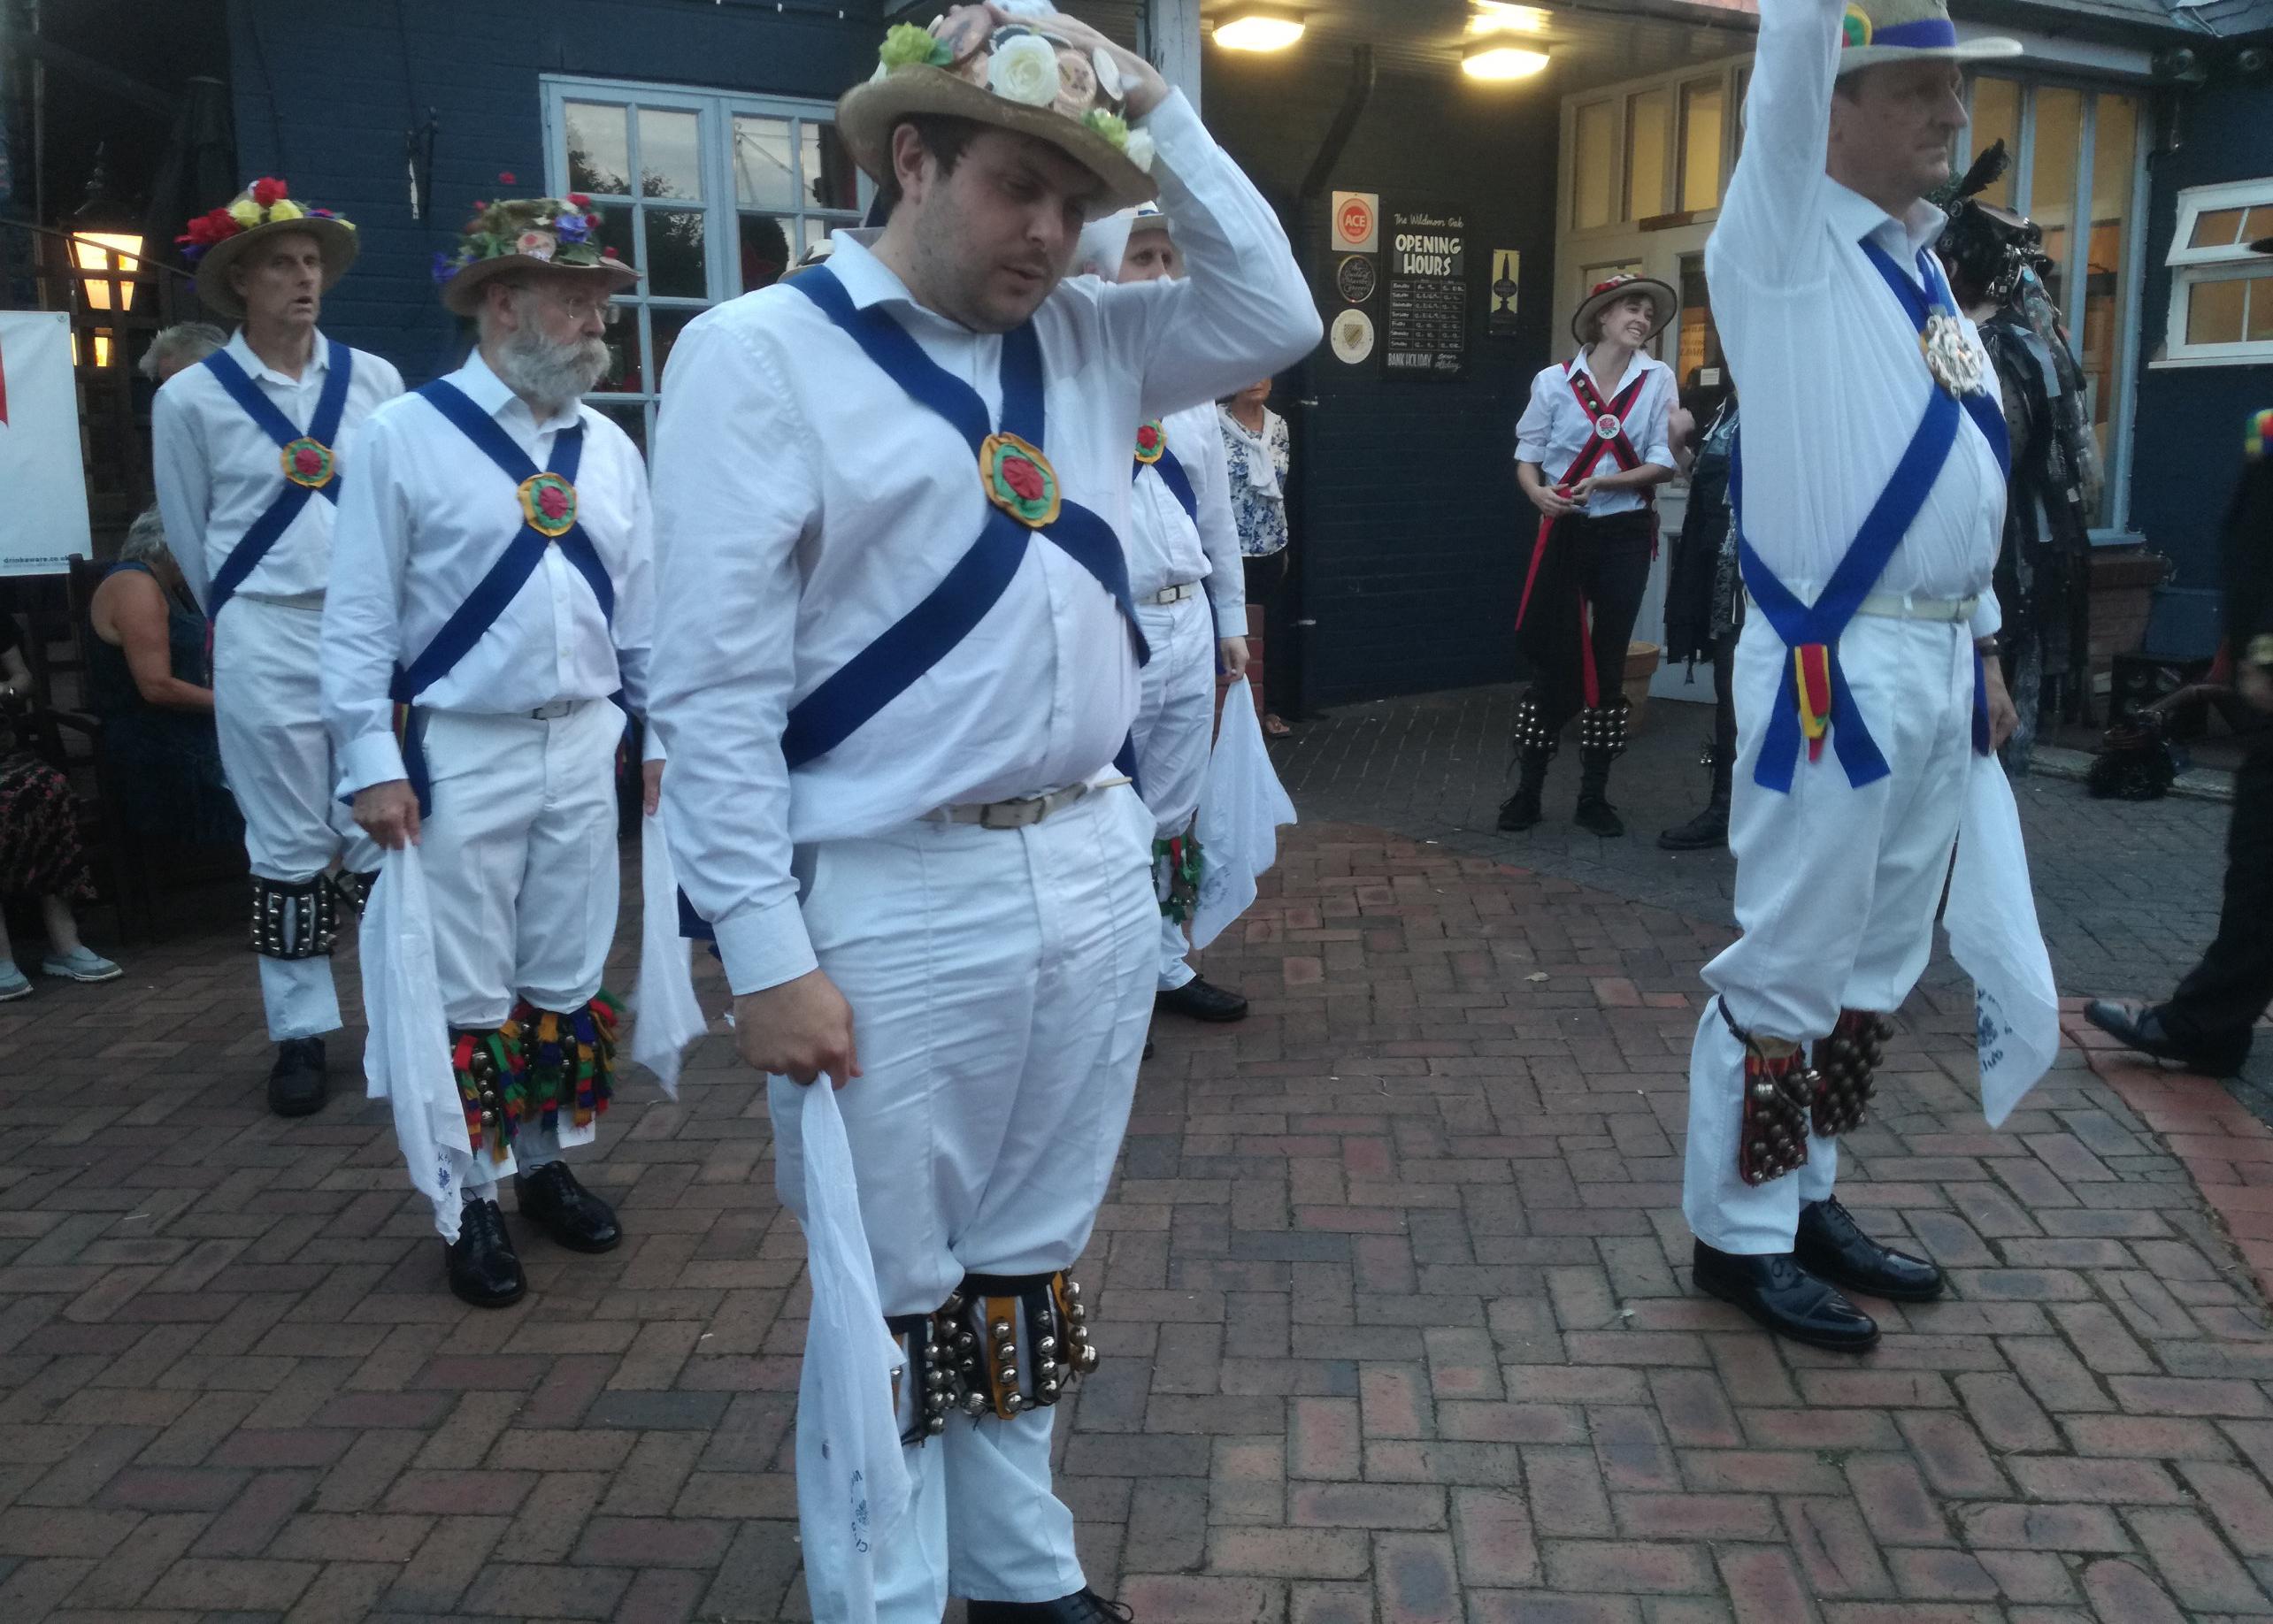 Dancing with Aelfgythe Border Morris - Wildmoor Oak, Bromsgrove